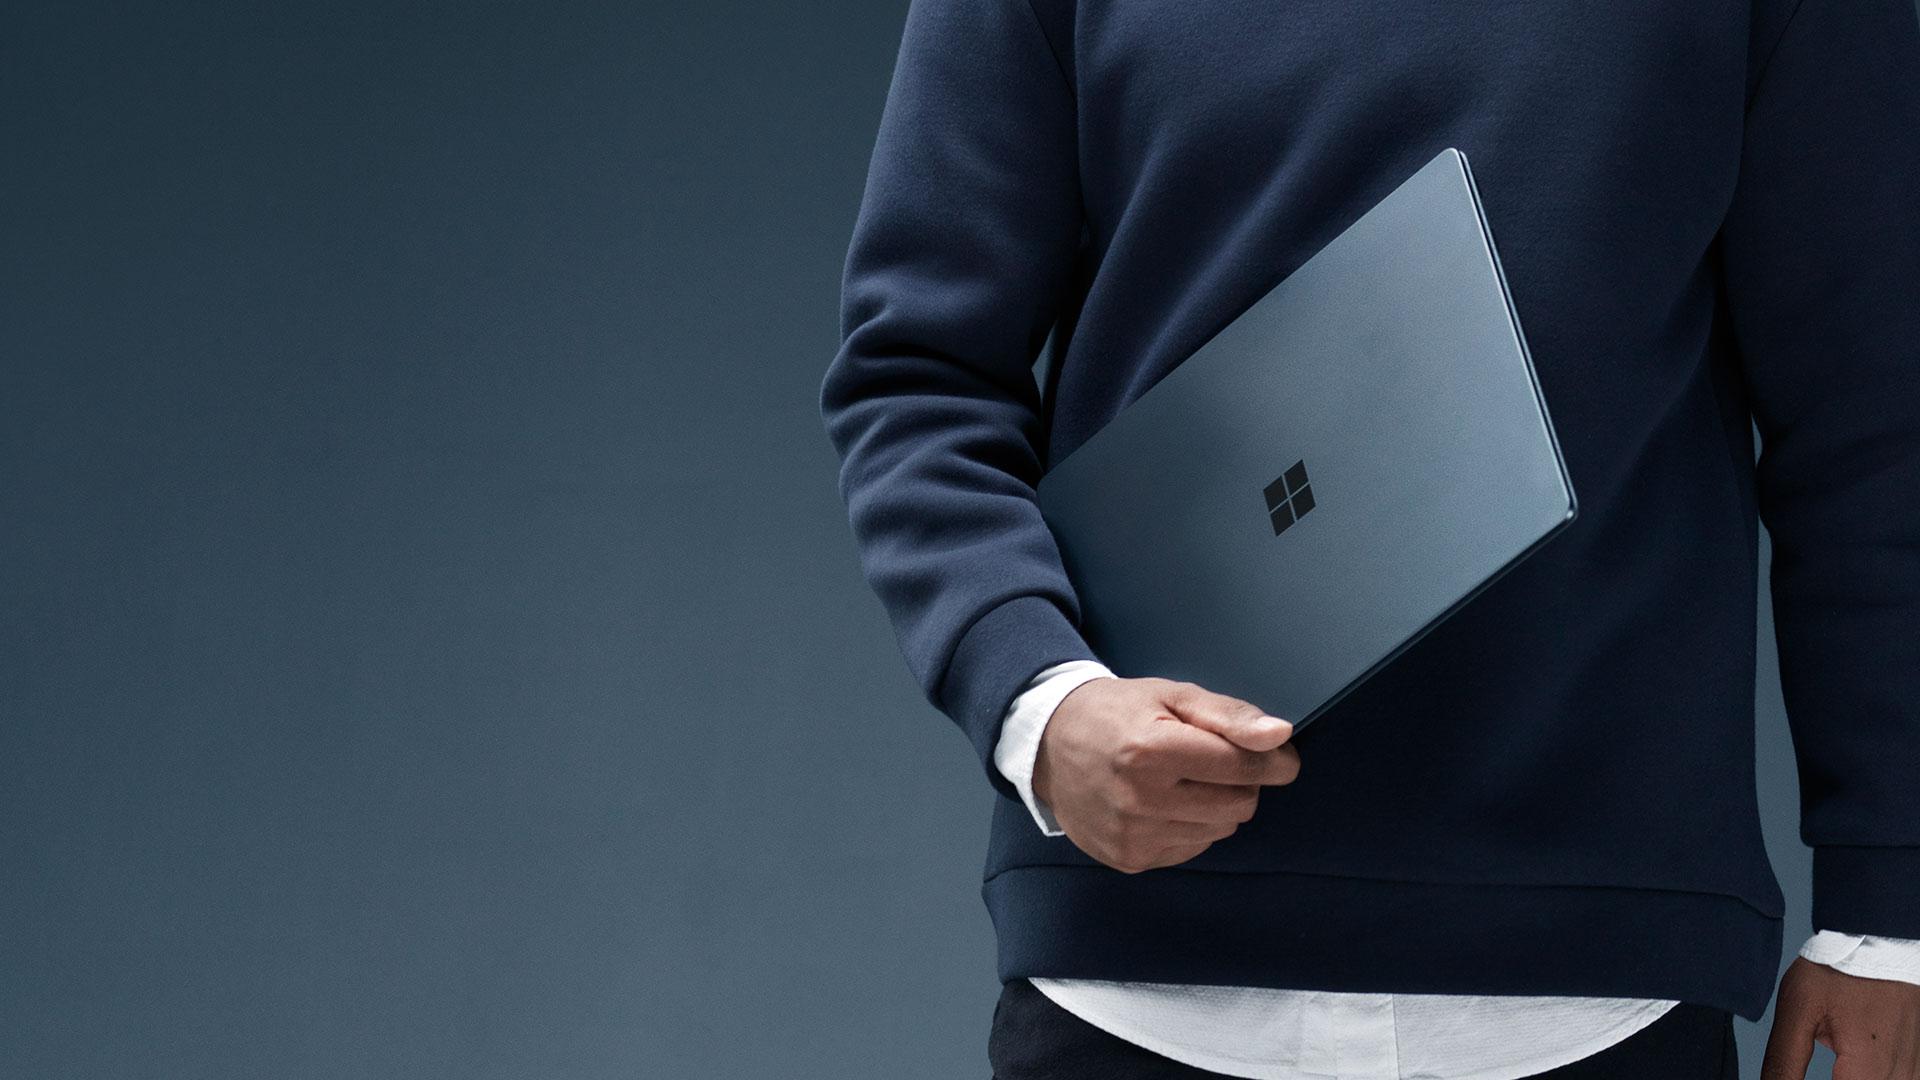 男人拿着灰钴蓝 Surface Laptop